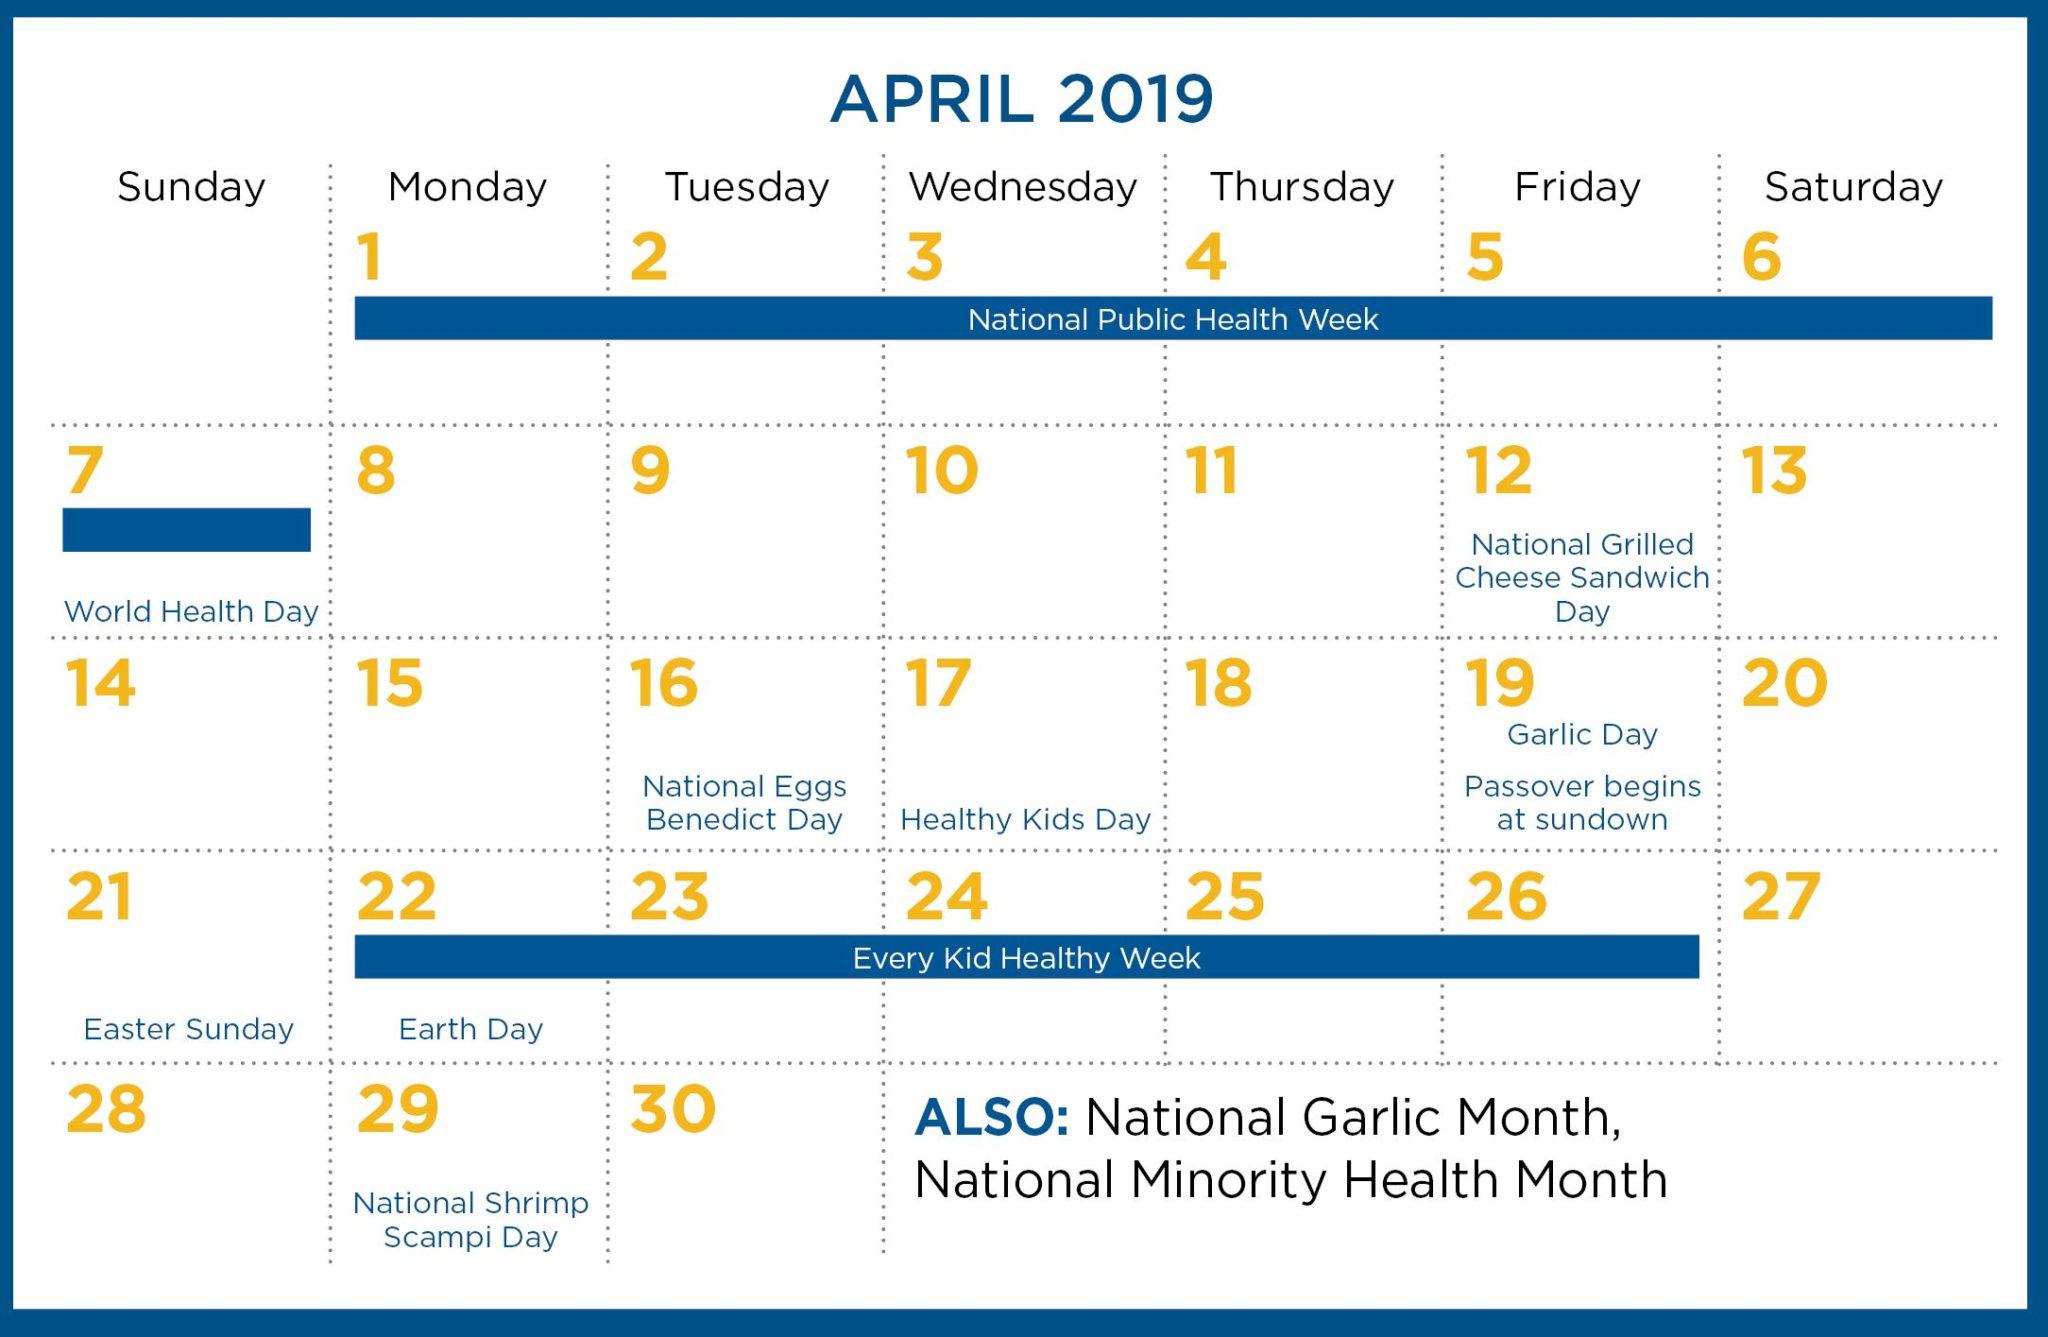 April 2019 calendar